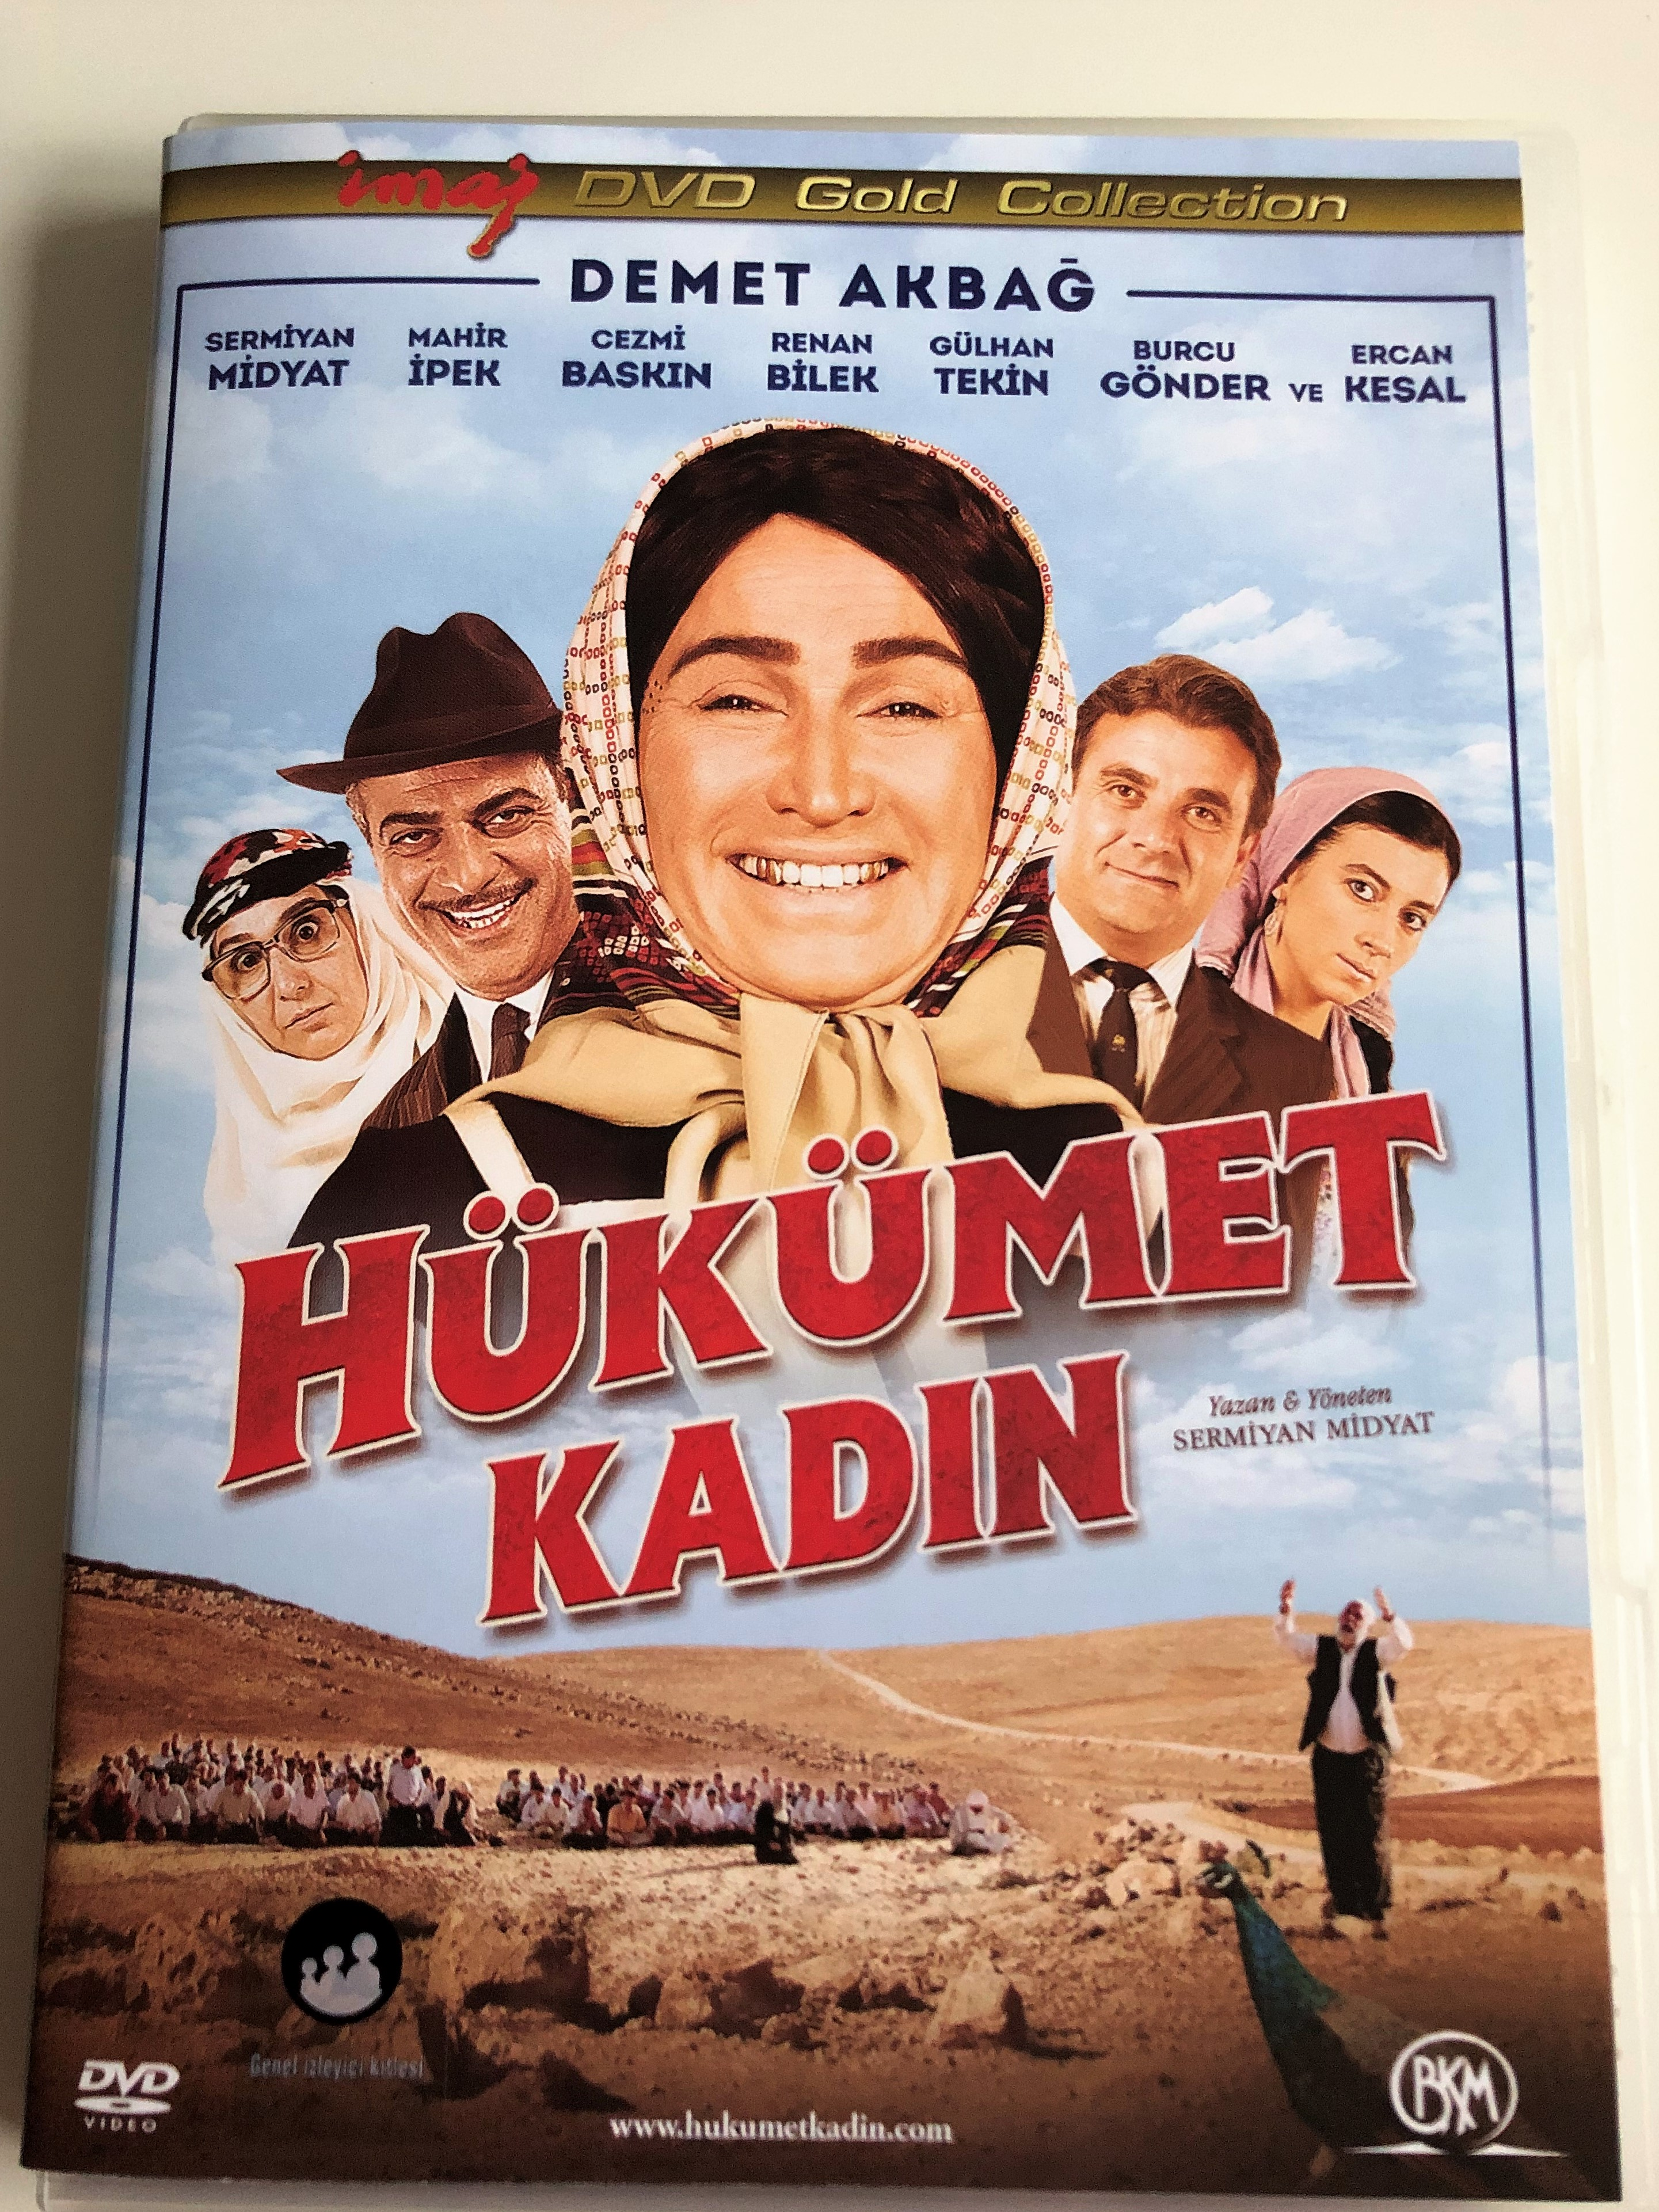 h-k-met-kad-n-dvd-2013-government-woman-1-.jpg